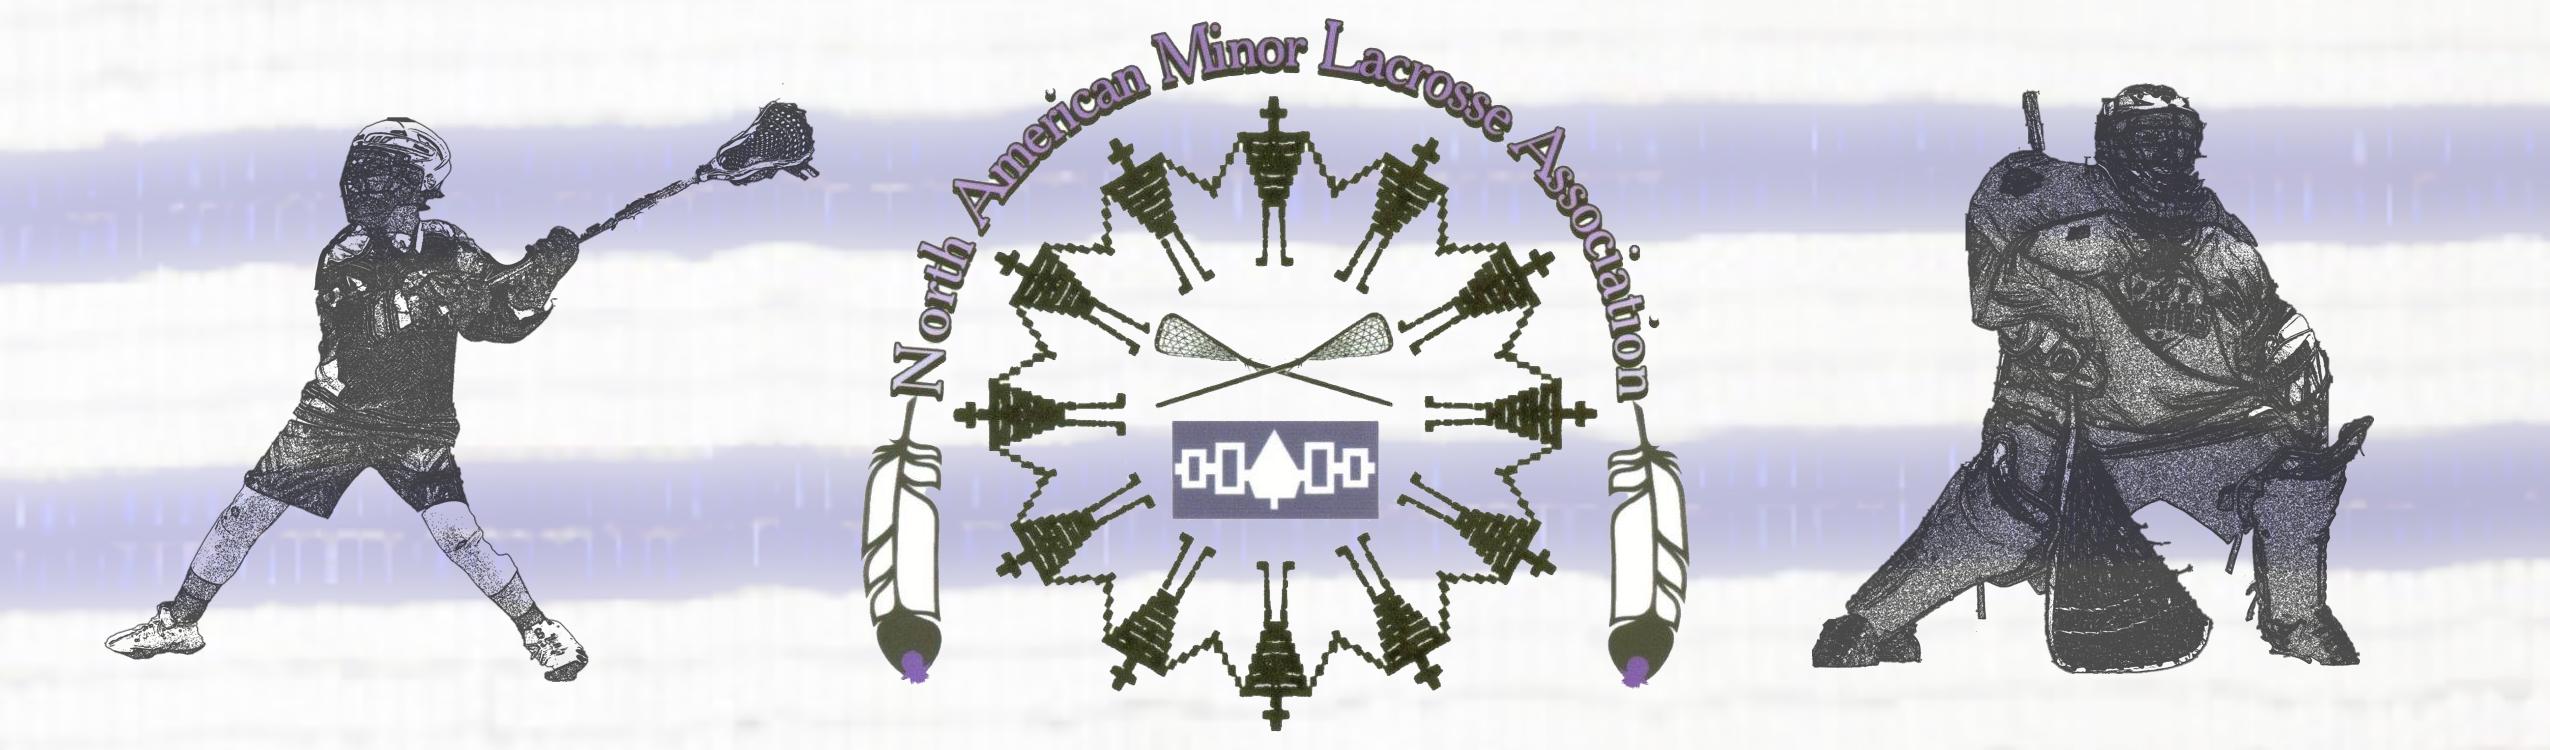 Namla site banner